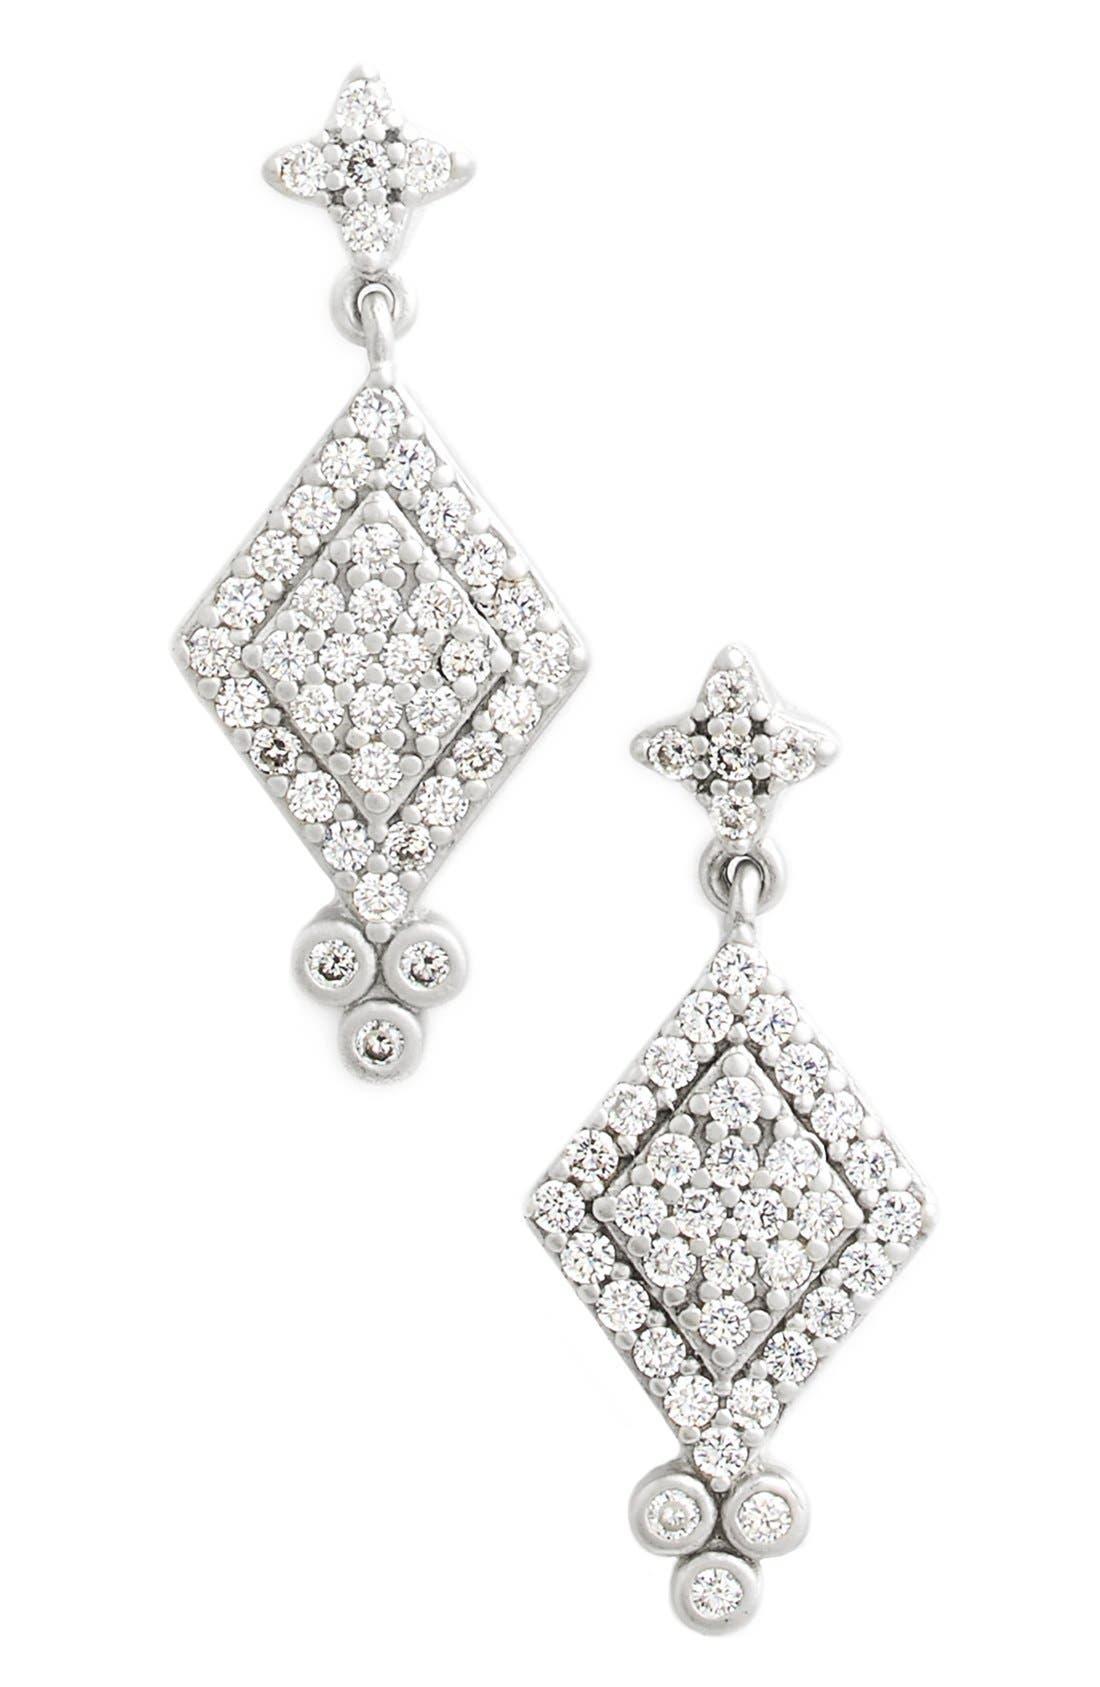 Main Image - FREIDA ROTHMAN 'Metropolitan' Pavé Drop Earrings